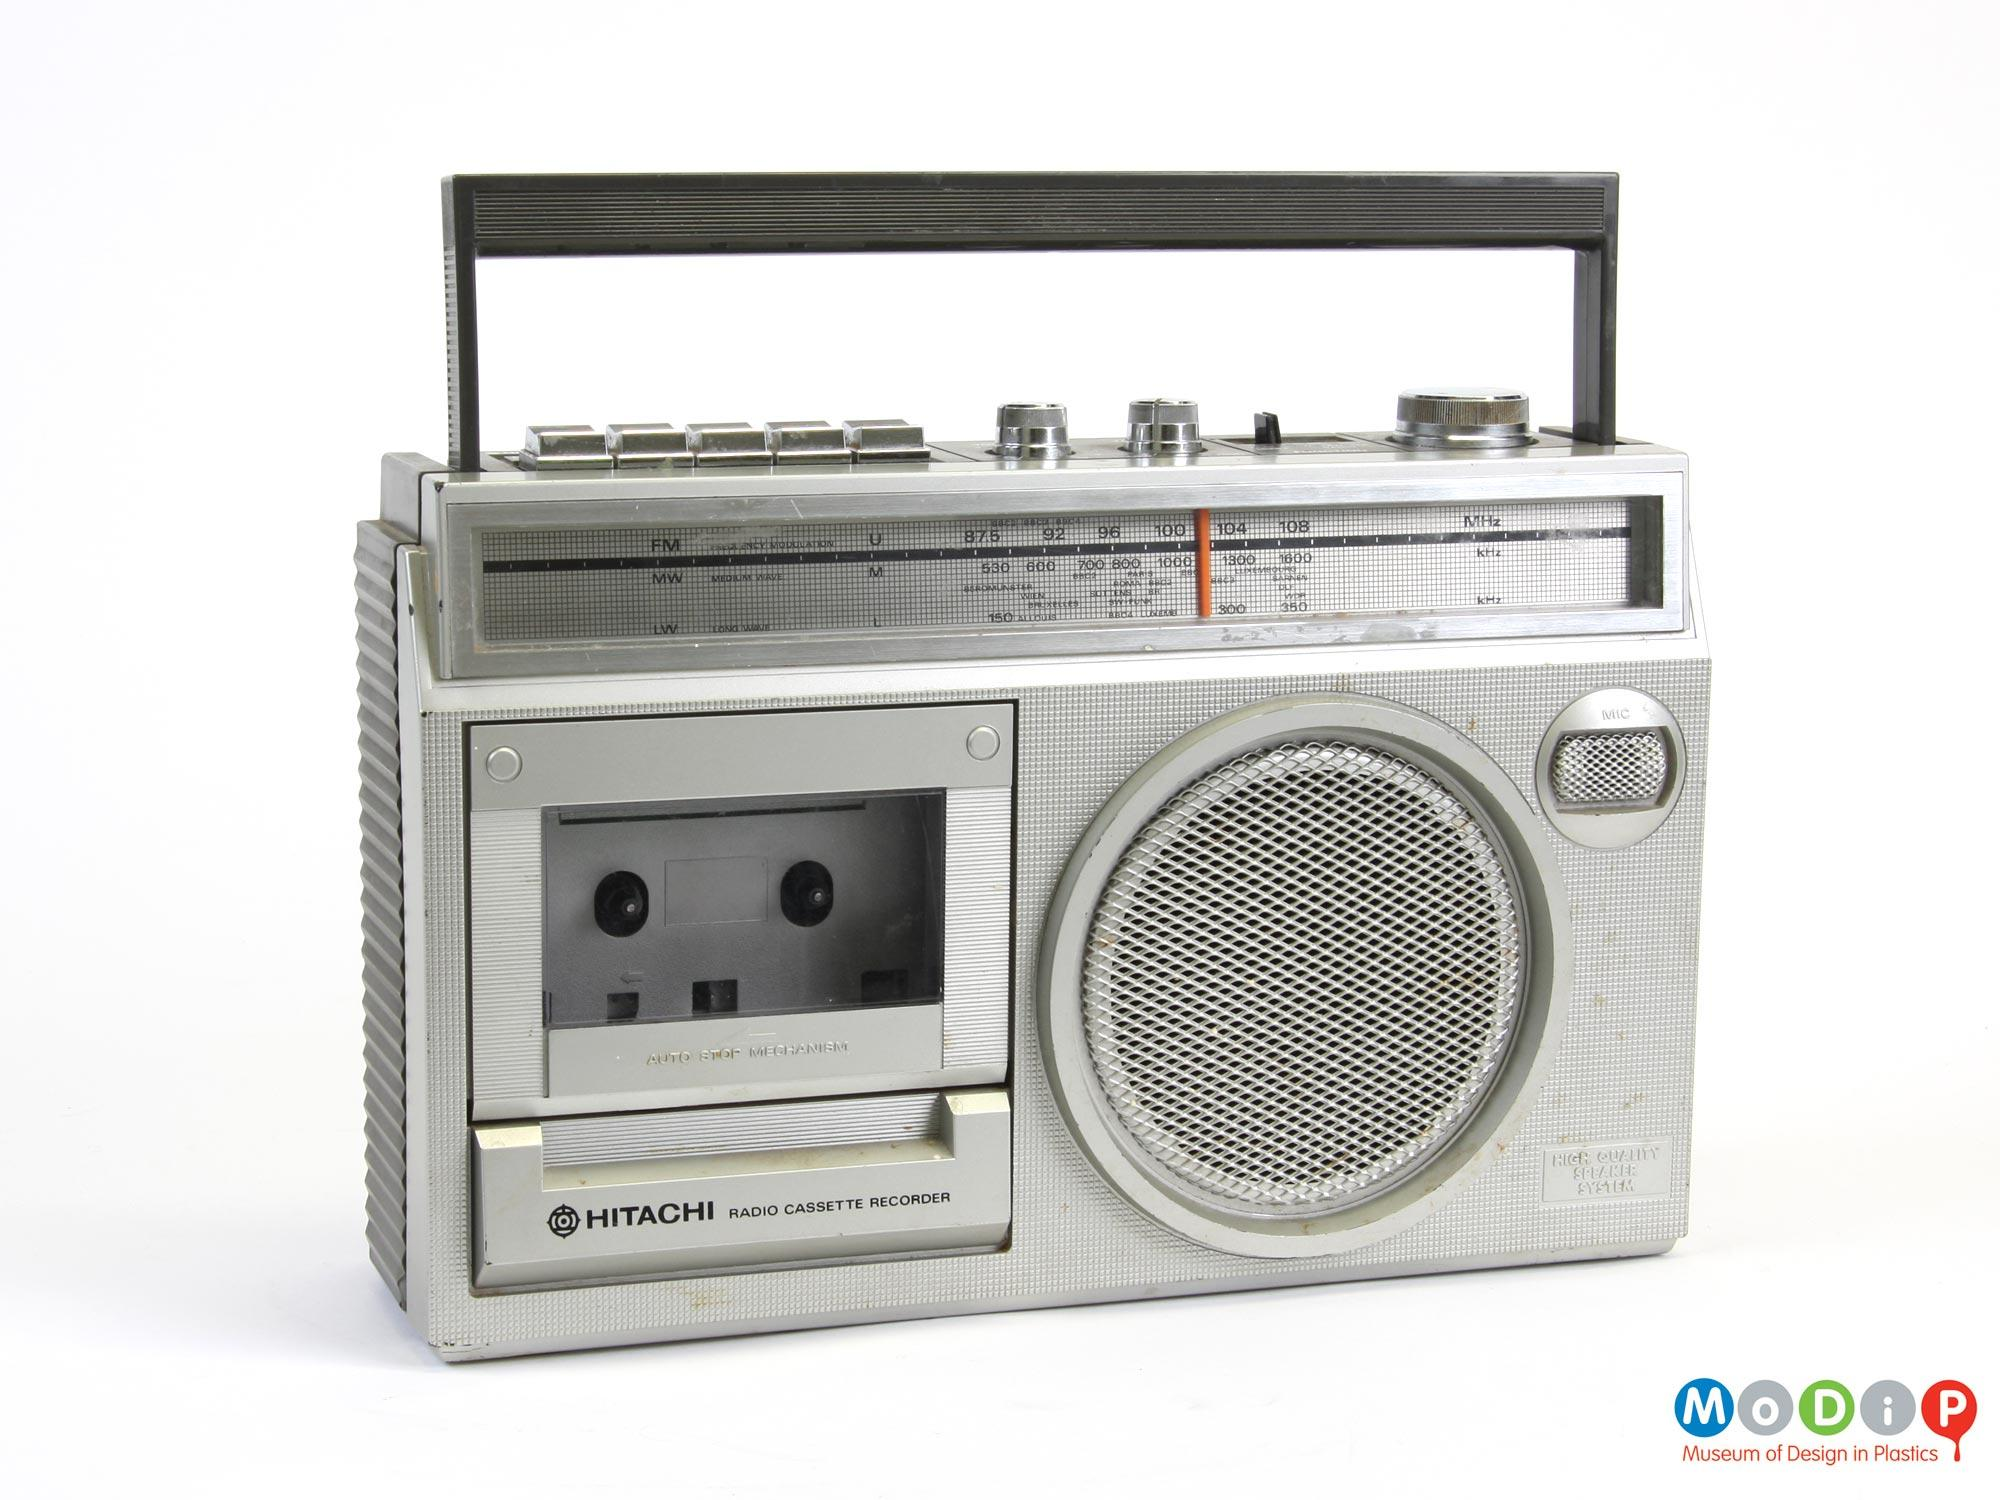 Hitachi Trk 5351l Radio Cassette Recorder